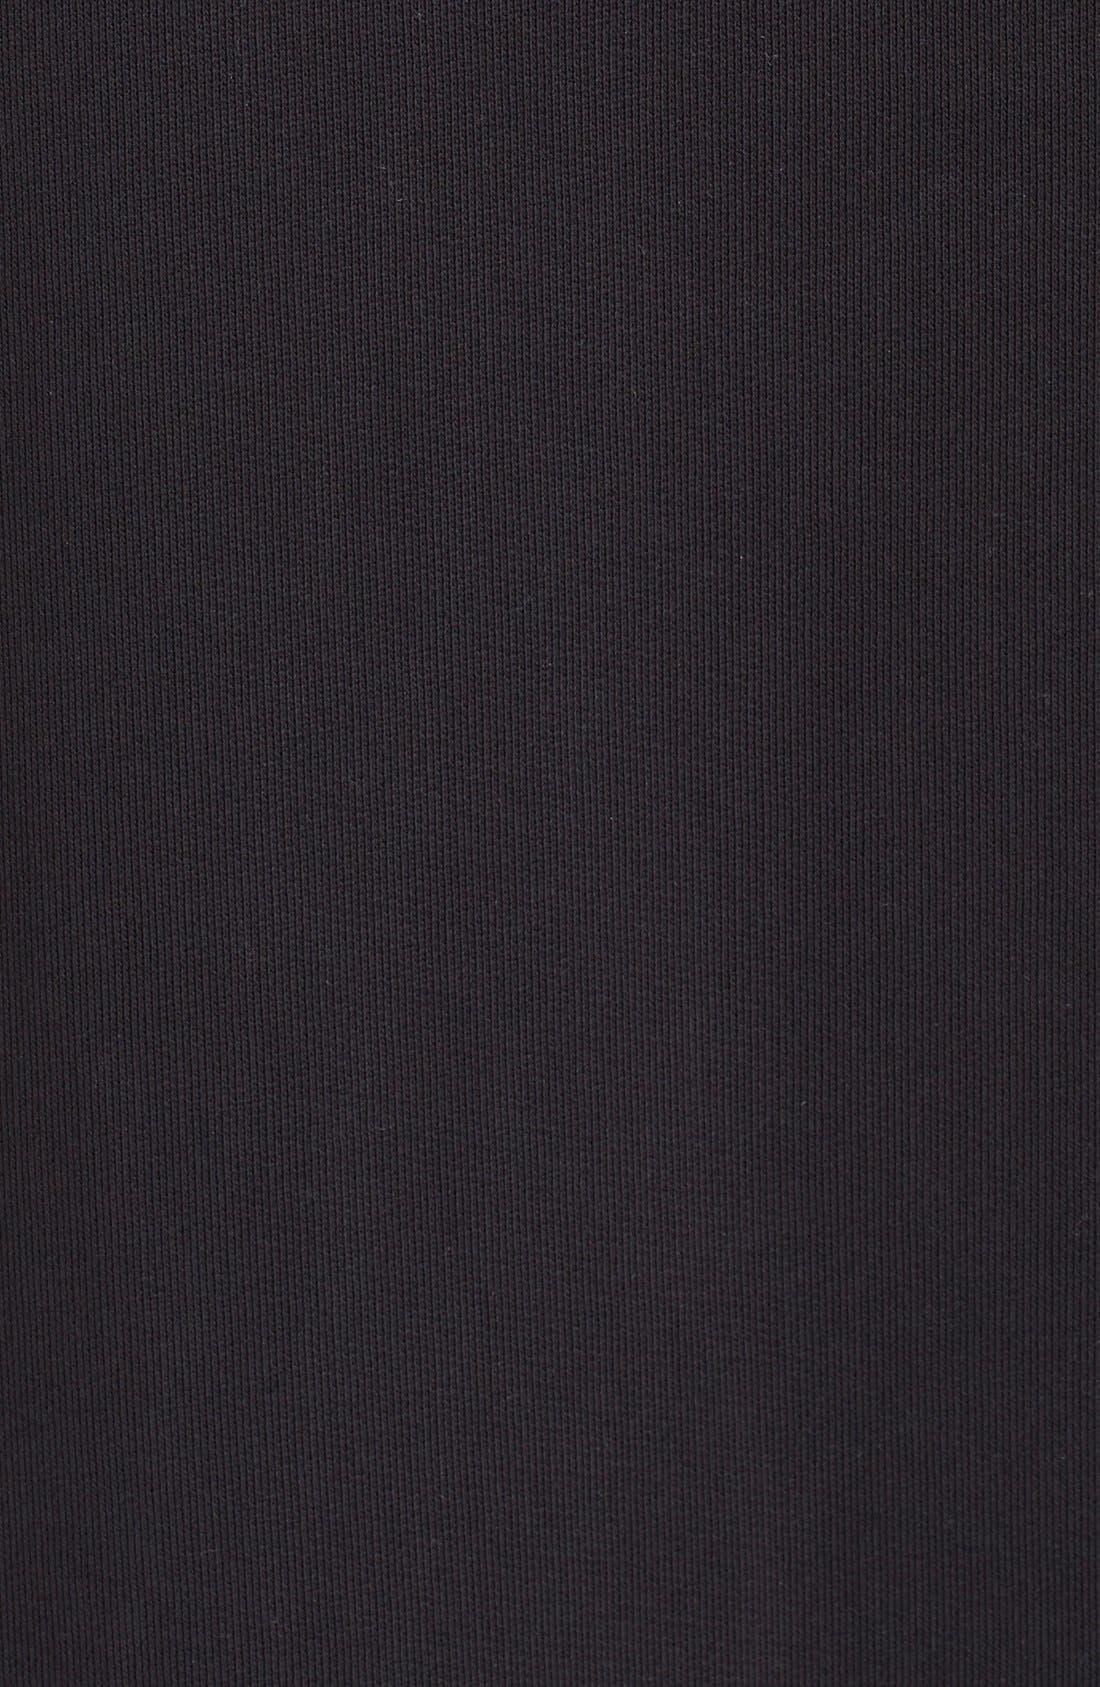 Alternate Image 5  - MM6 Maison Margiela Chiffon Hem Sweatshirt Dress